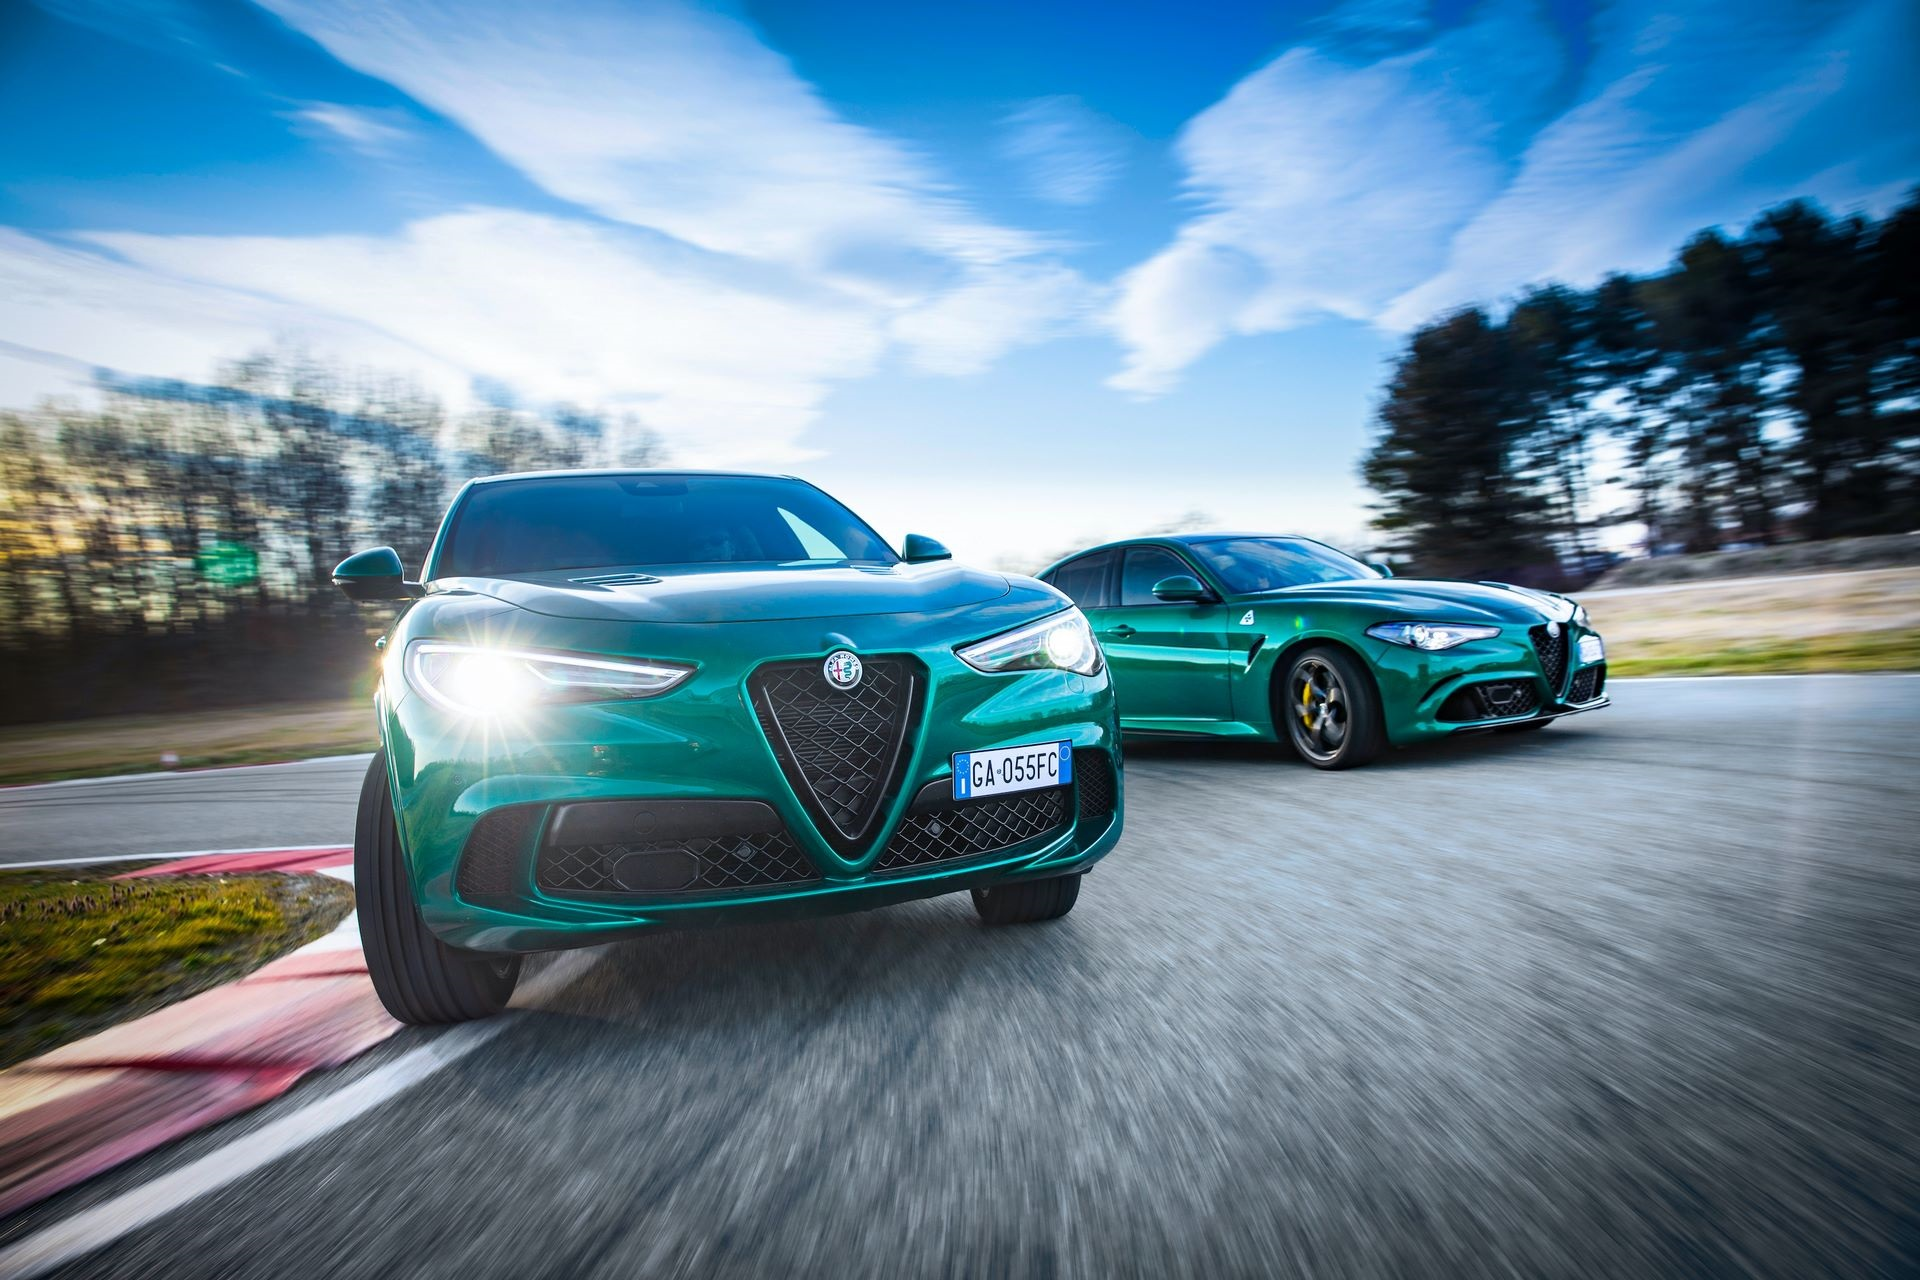 Alfa-Romeo-Giulia-Quadrifoglio-Stelvio-Quadrifoglio-facelift-2020-5